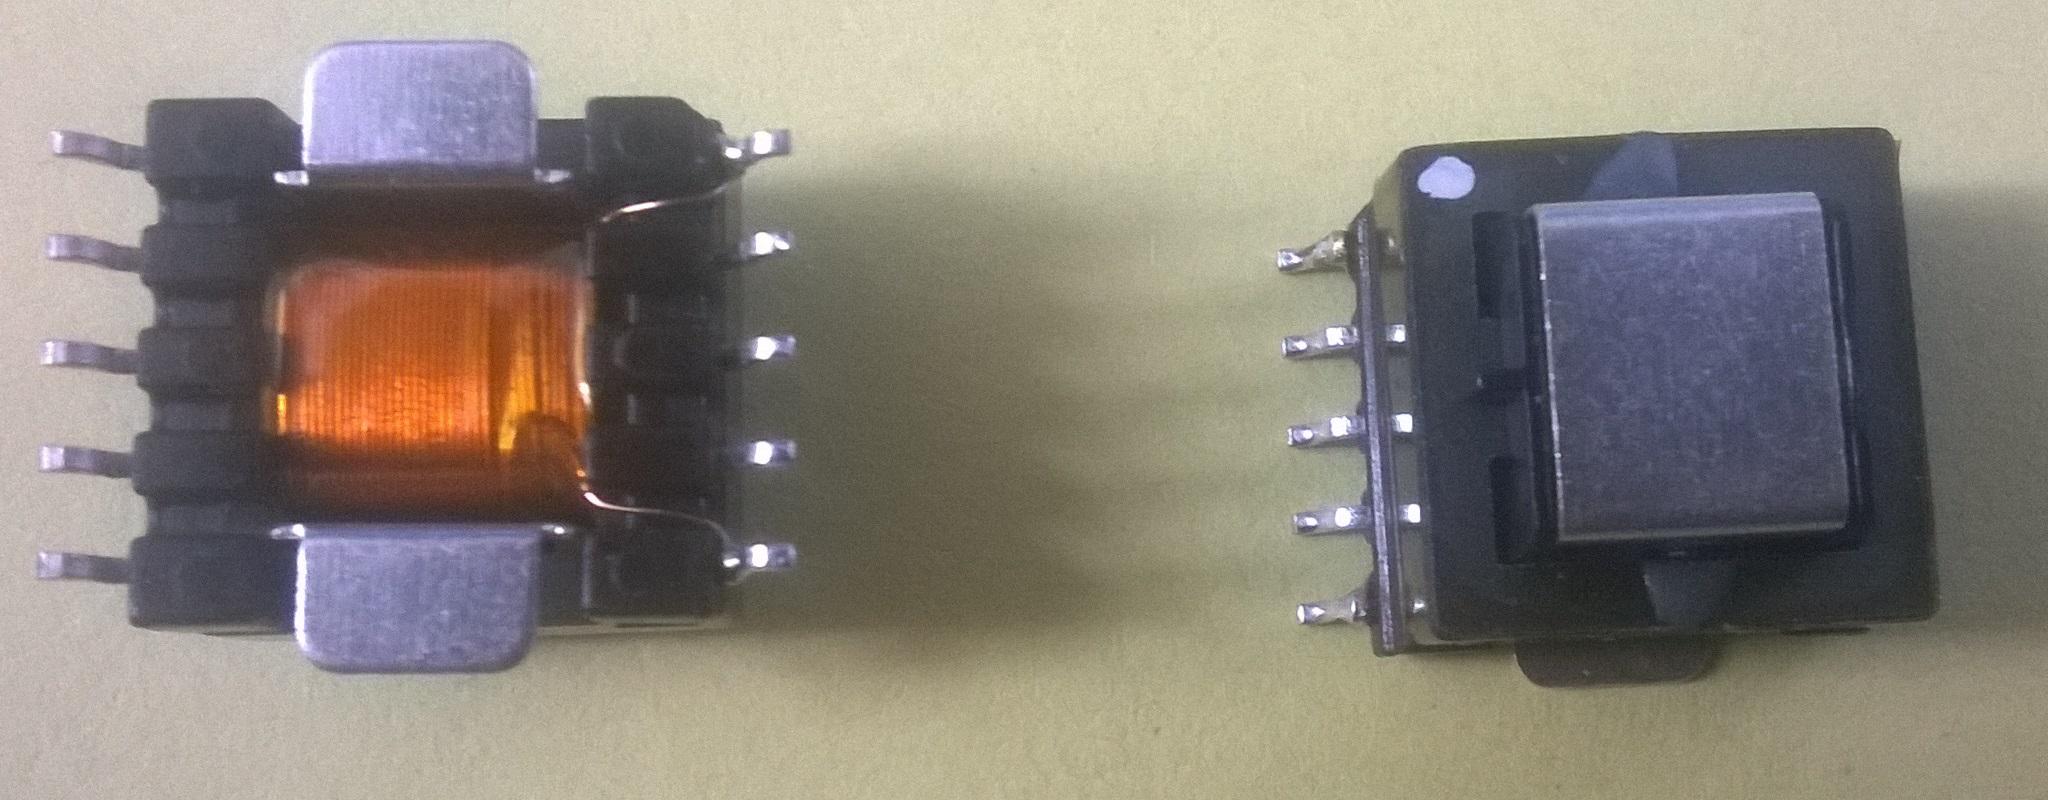 Smt Current Transformer 10a Crootem Electronics